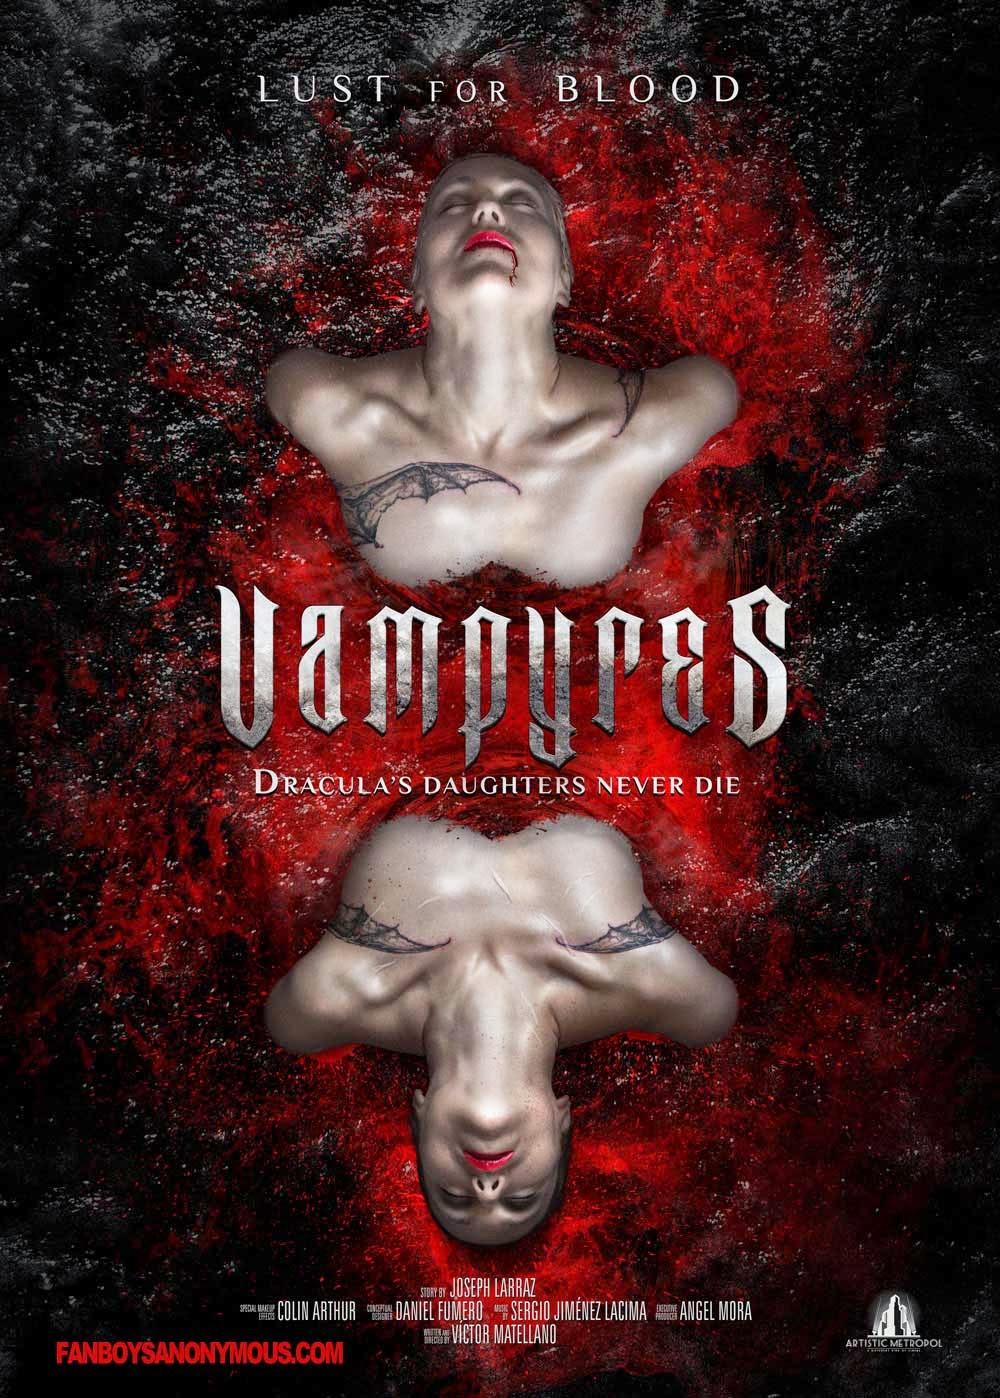 vampires art poster sexy blood horror lust sex